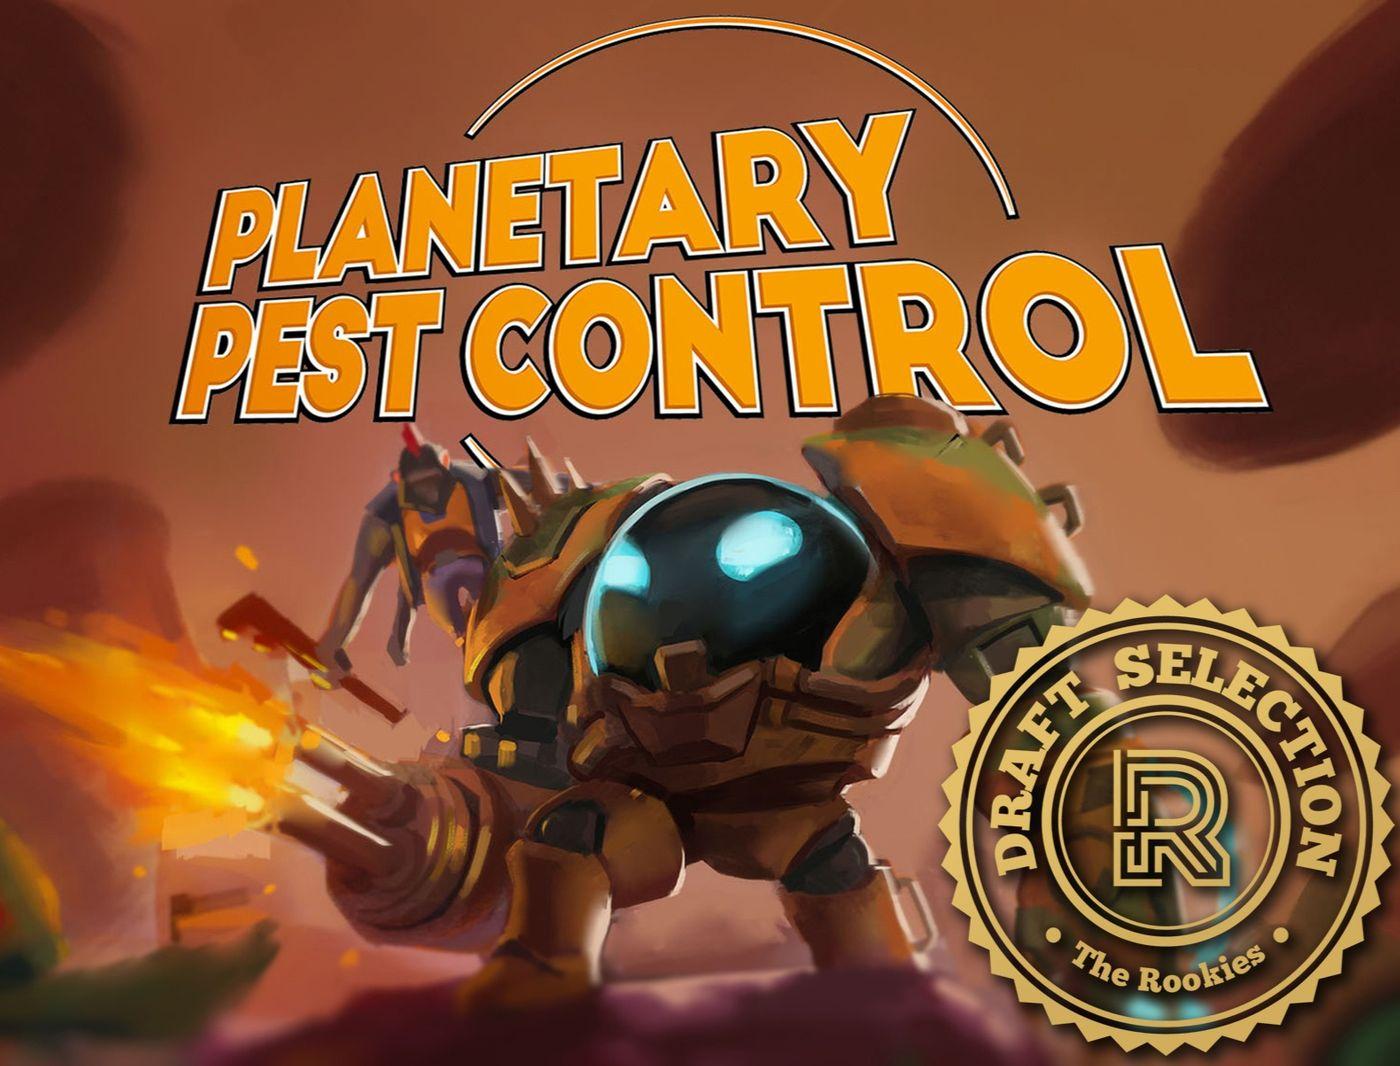 Planetary Pest Control